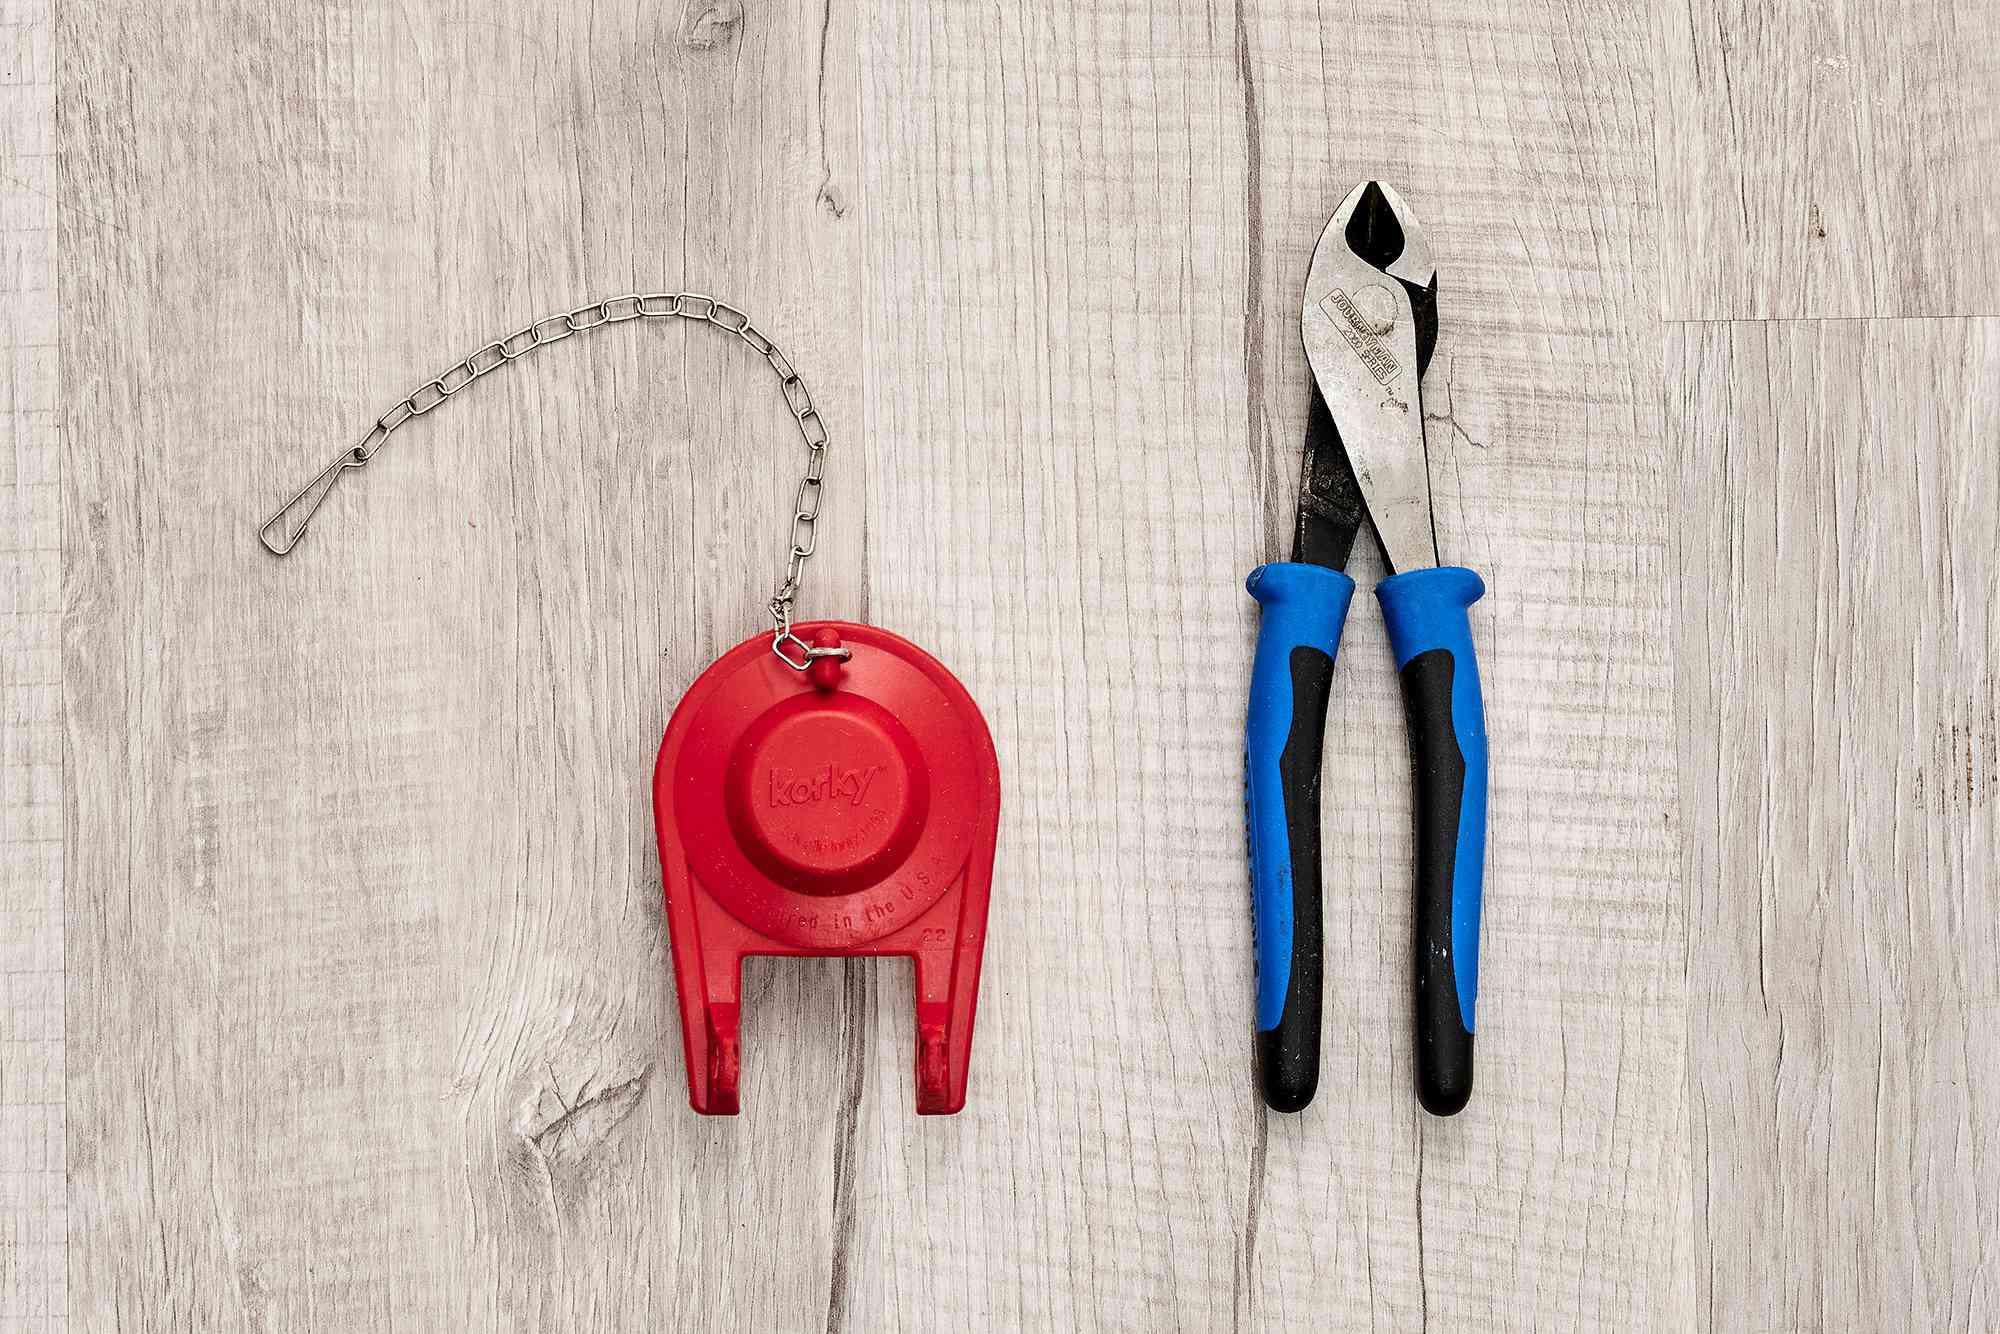 Materials and tools to fix a stuck toilet handle